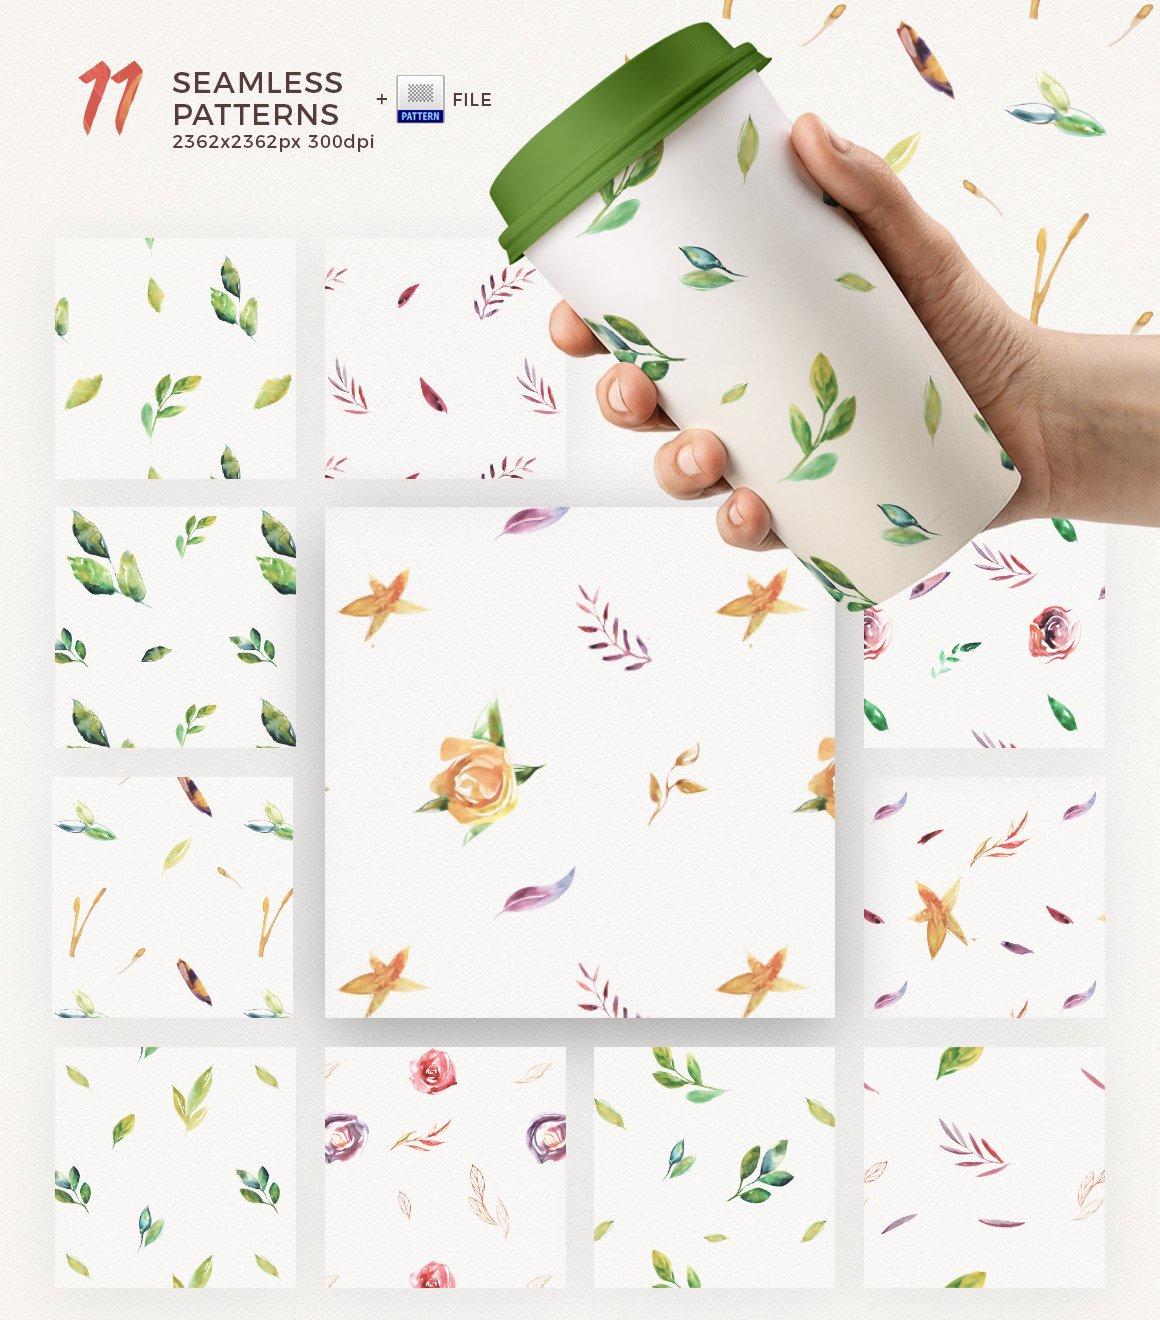 高清手绘花卉树叶水彩剪贴画PNG免抠图片素材 Watercolor Handmade Design Bundle插图(7)